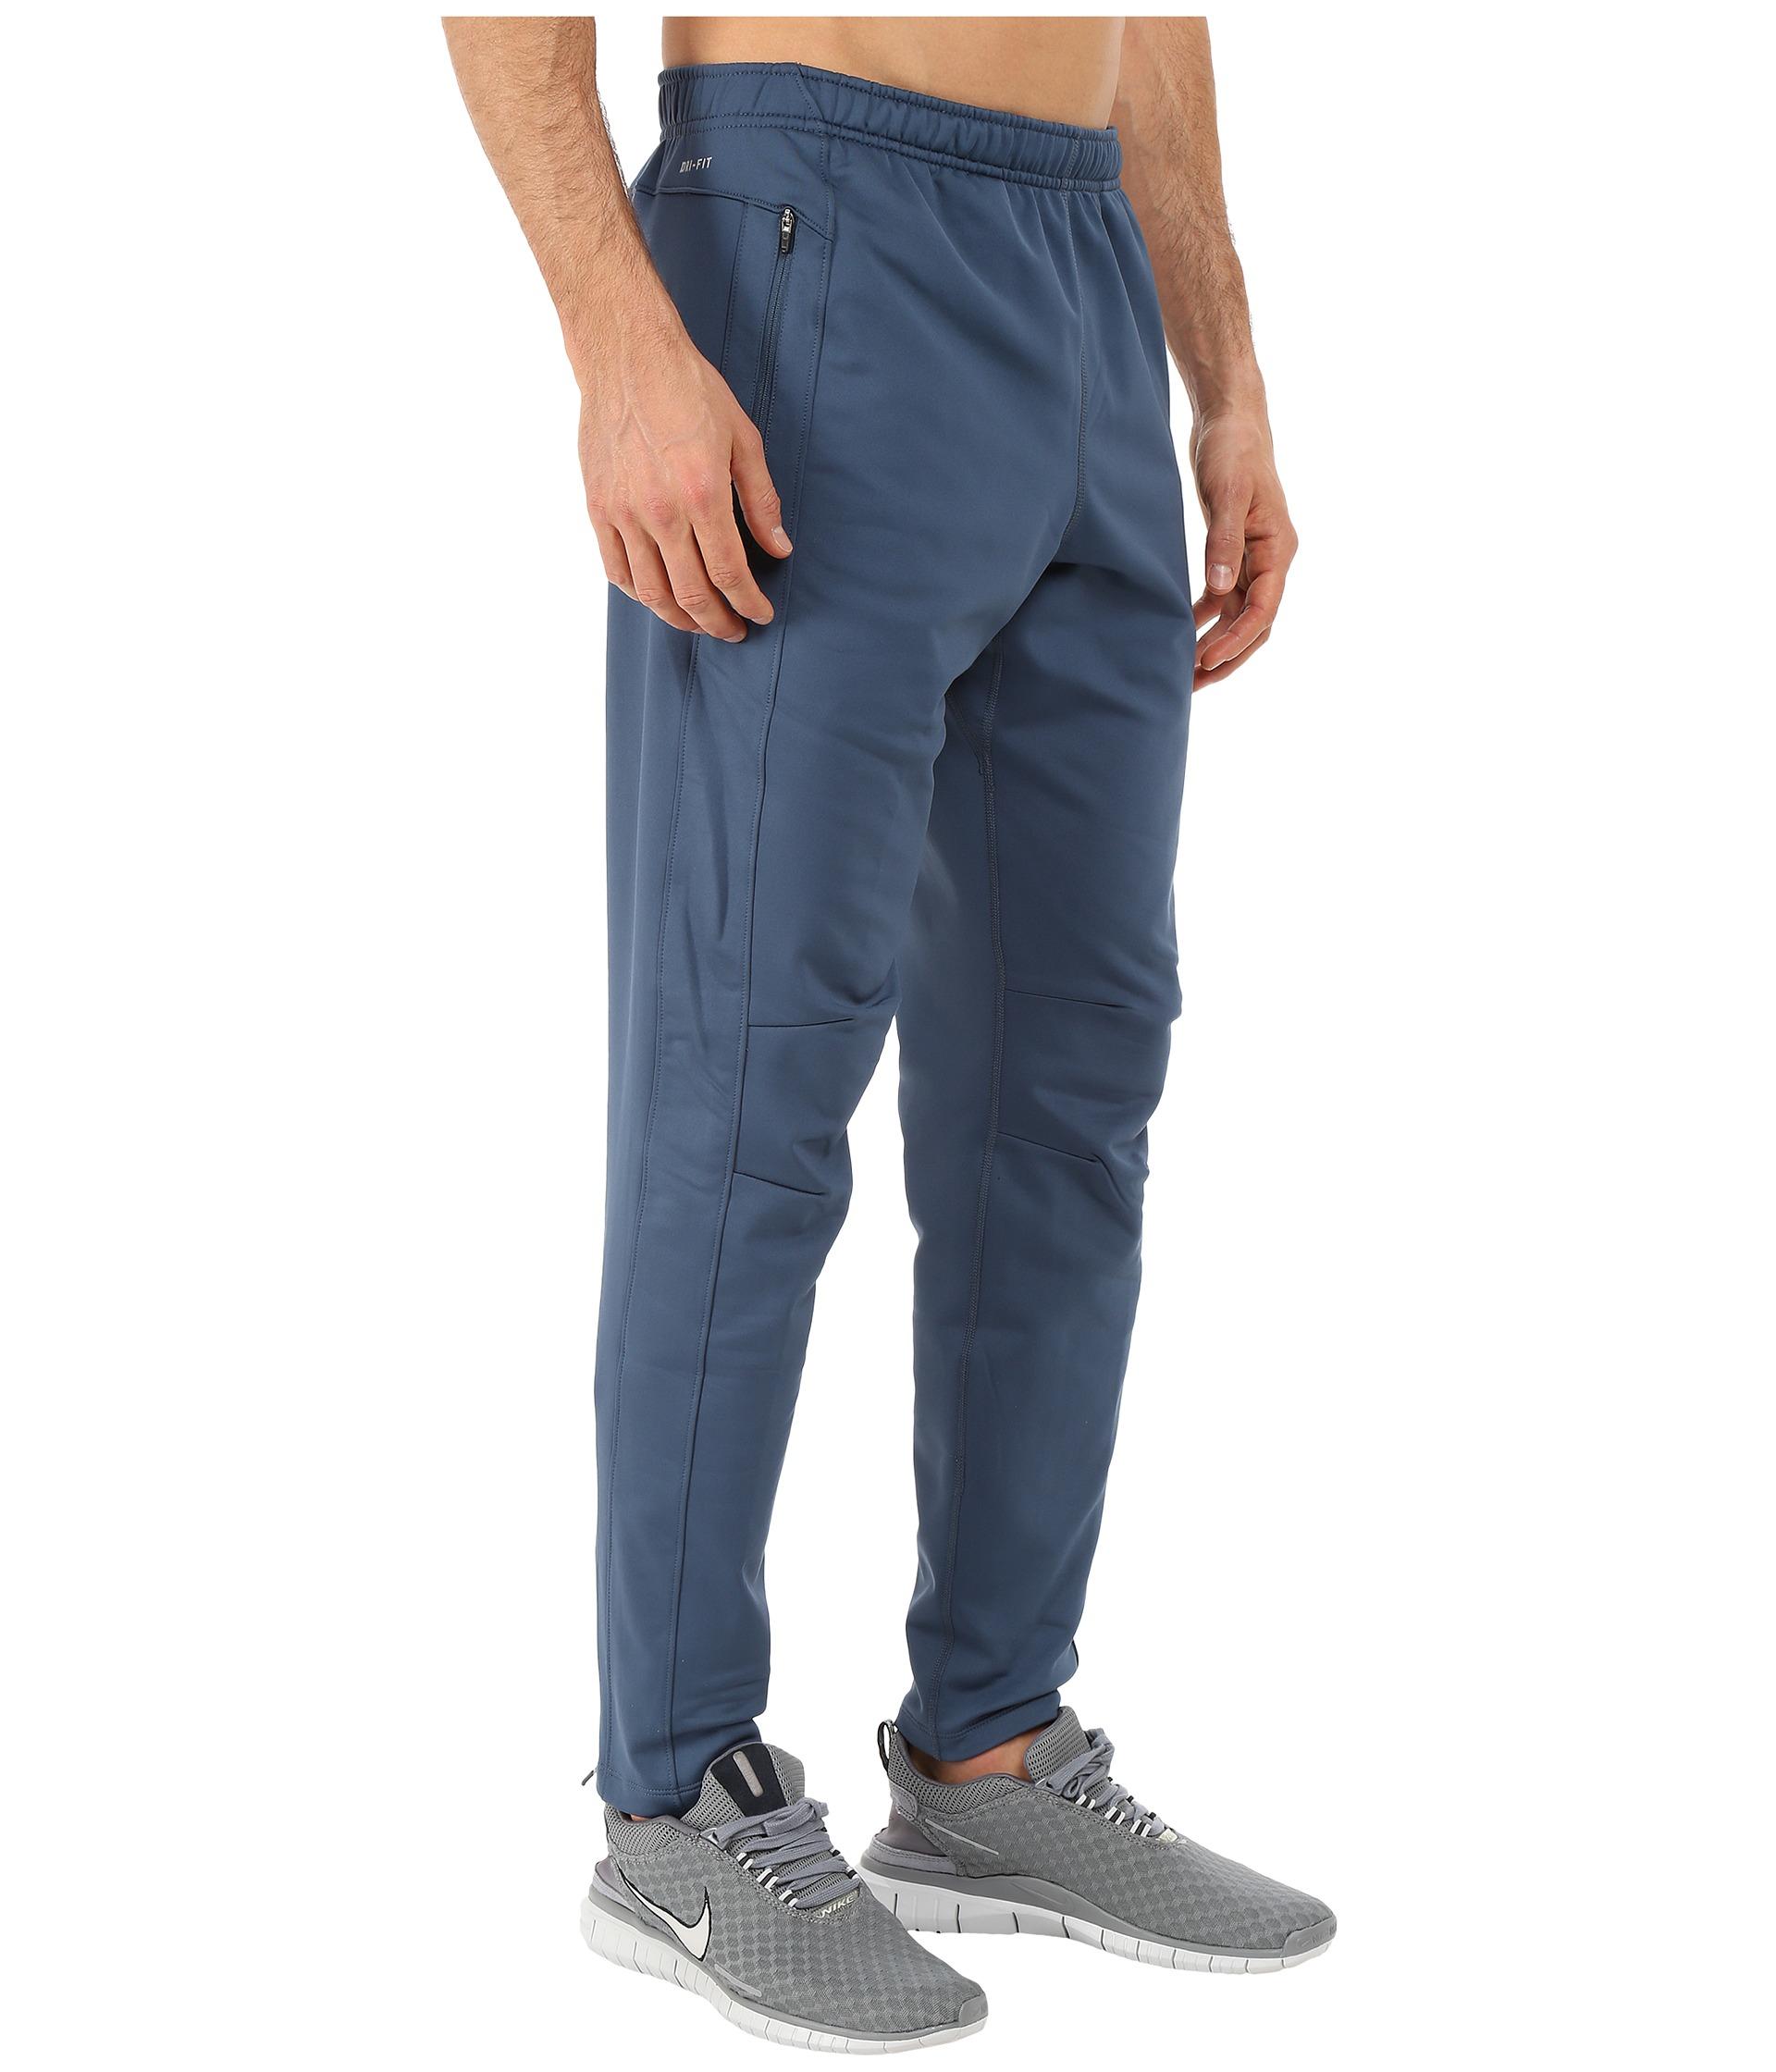 Nike Dri-fit™ Thermal Pants in Blue for Men   Lyst